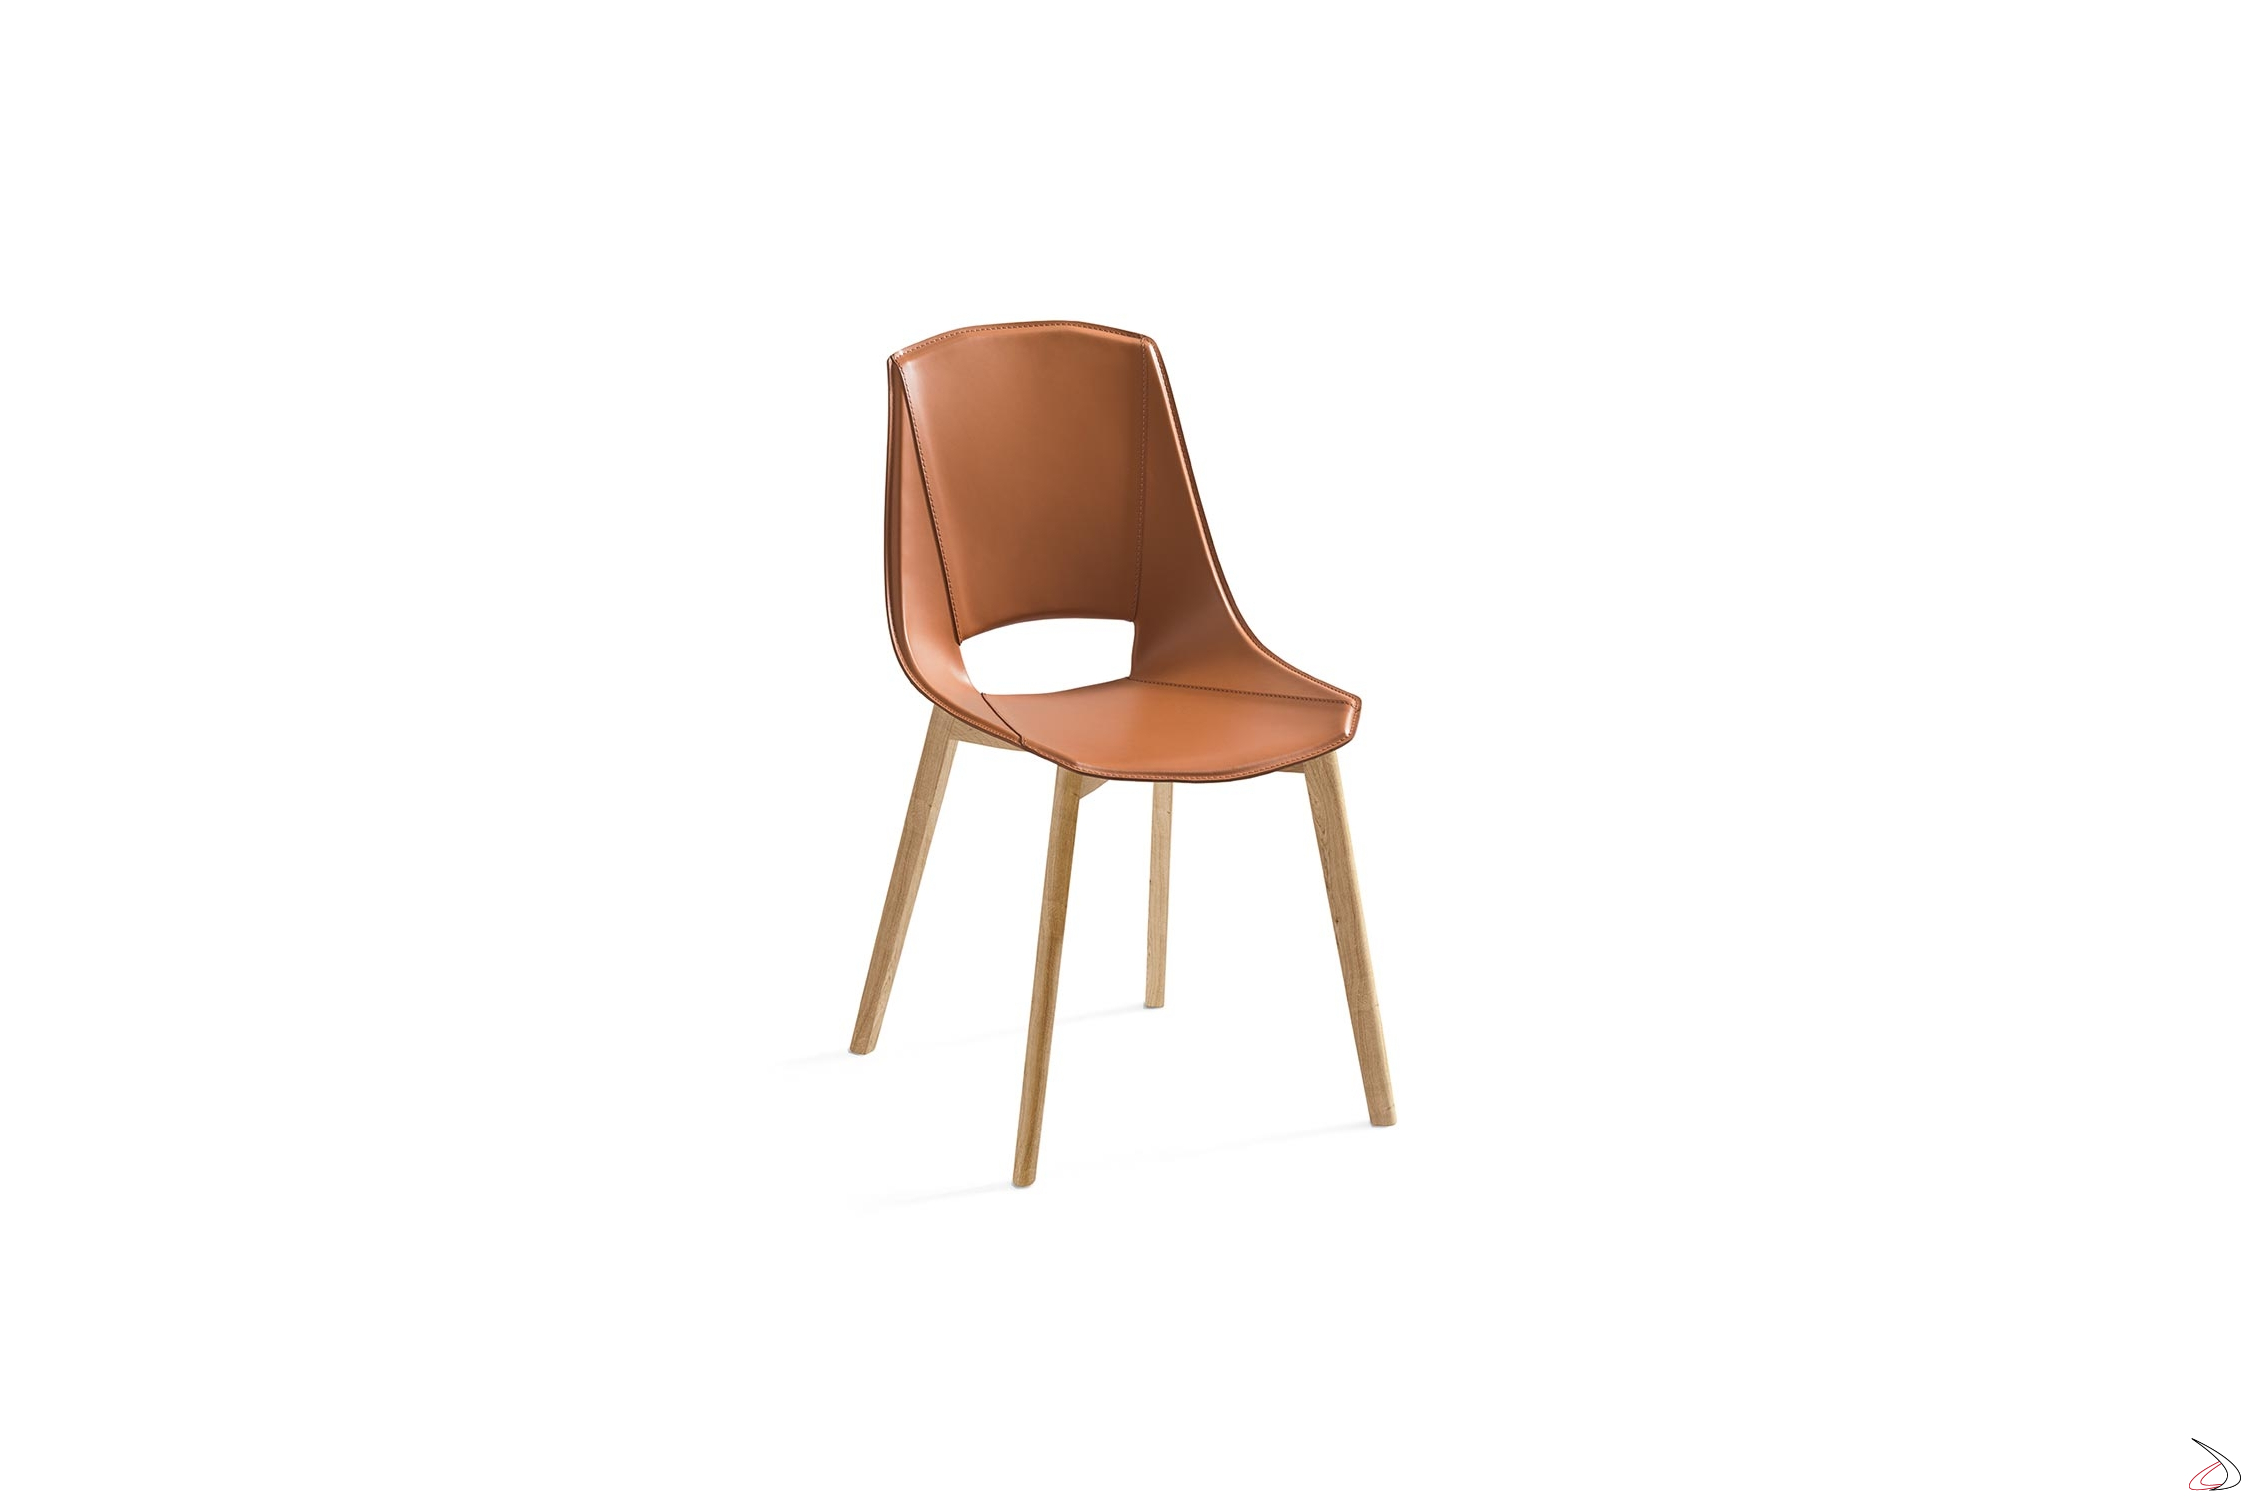 Sedie Design Legno E Pelle.Eva 5 Chair With Solid Wood Frame Toparredi Arredo Design Online